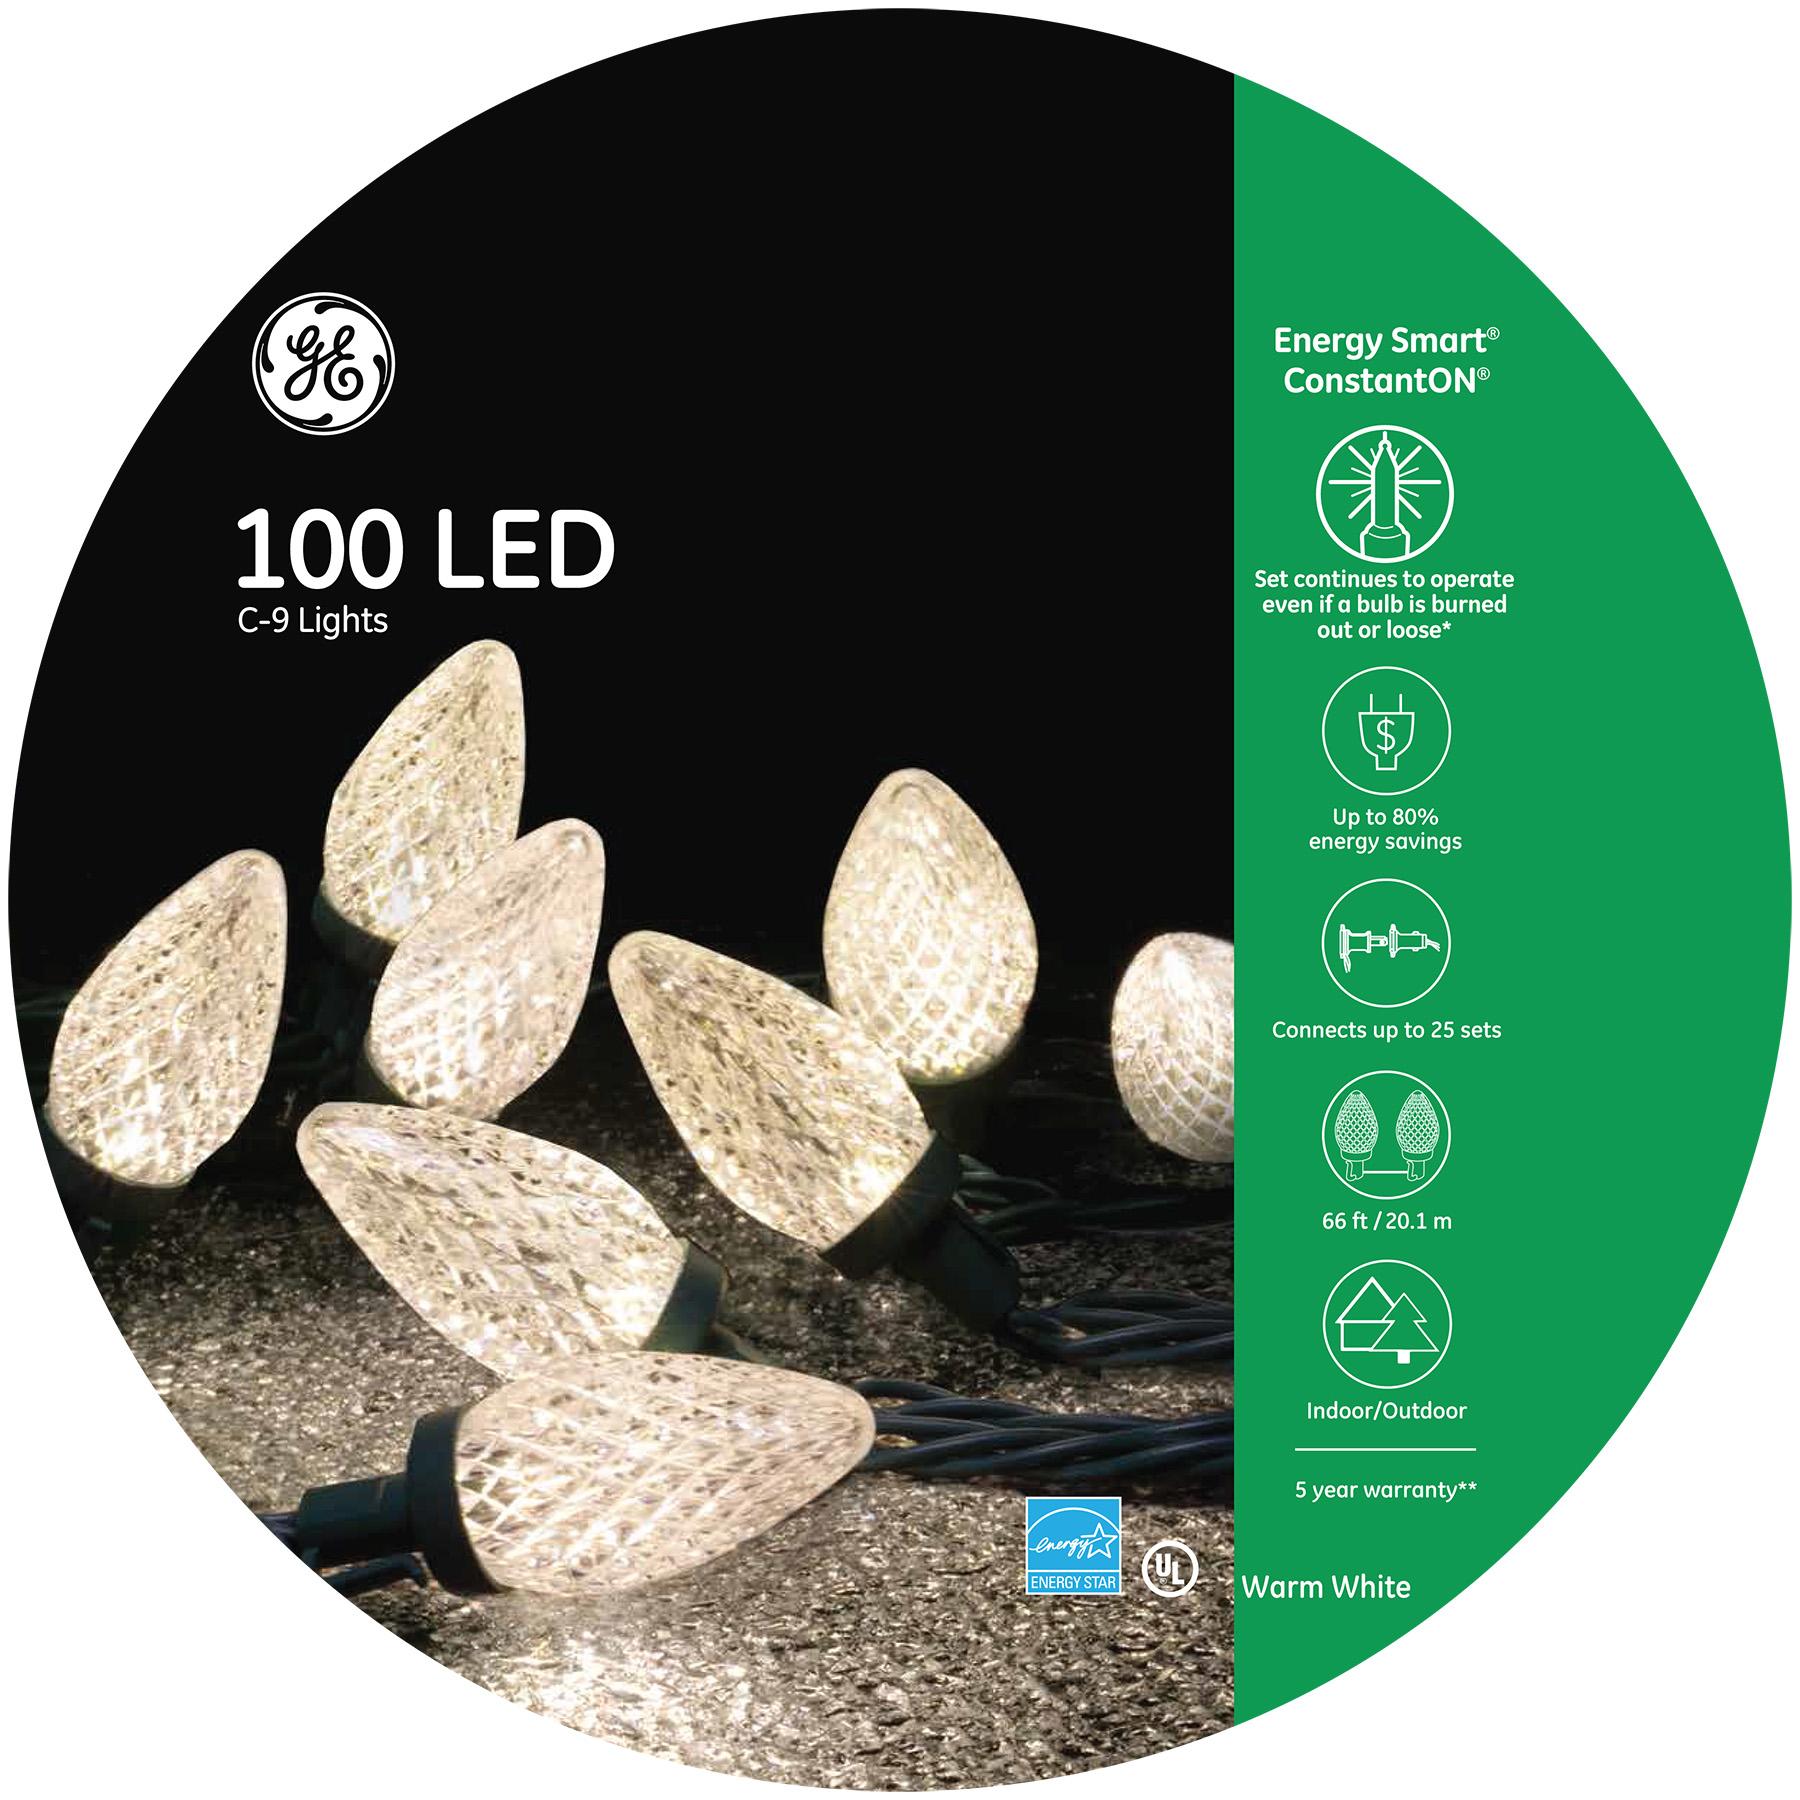 97732 Ge Energy Smart 174 Led C 9 Lights 100ct Warm White